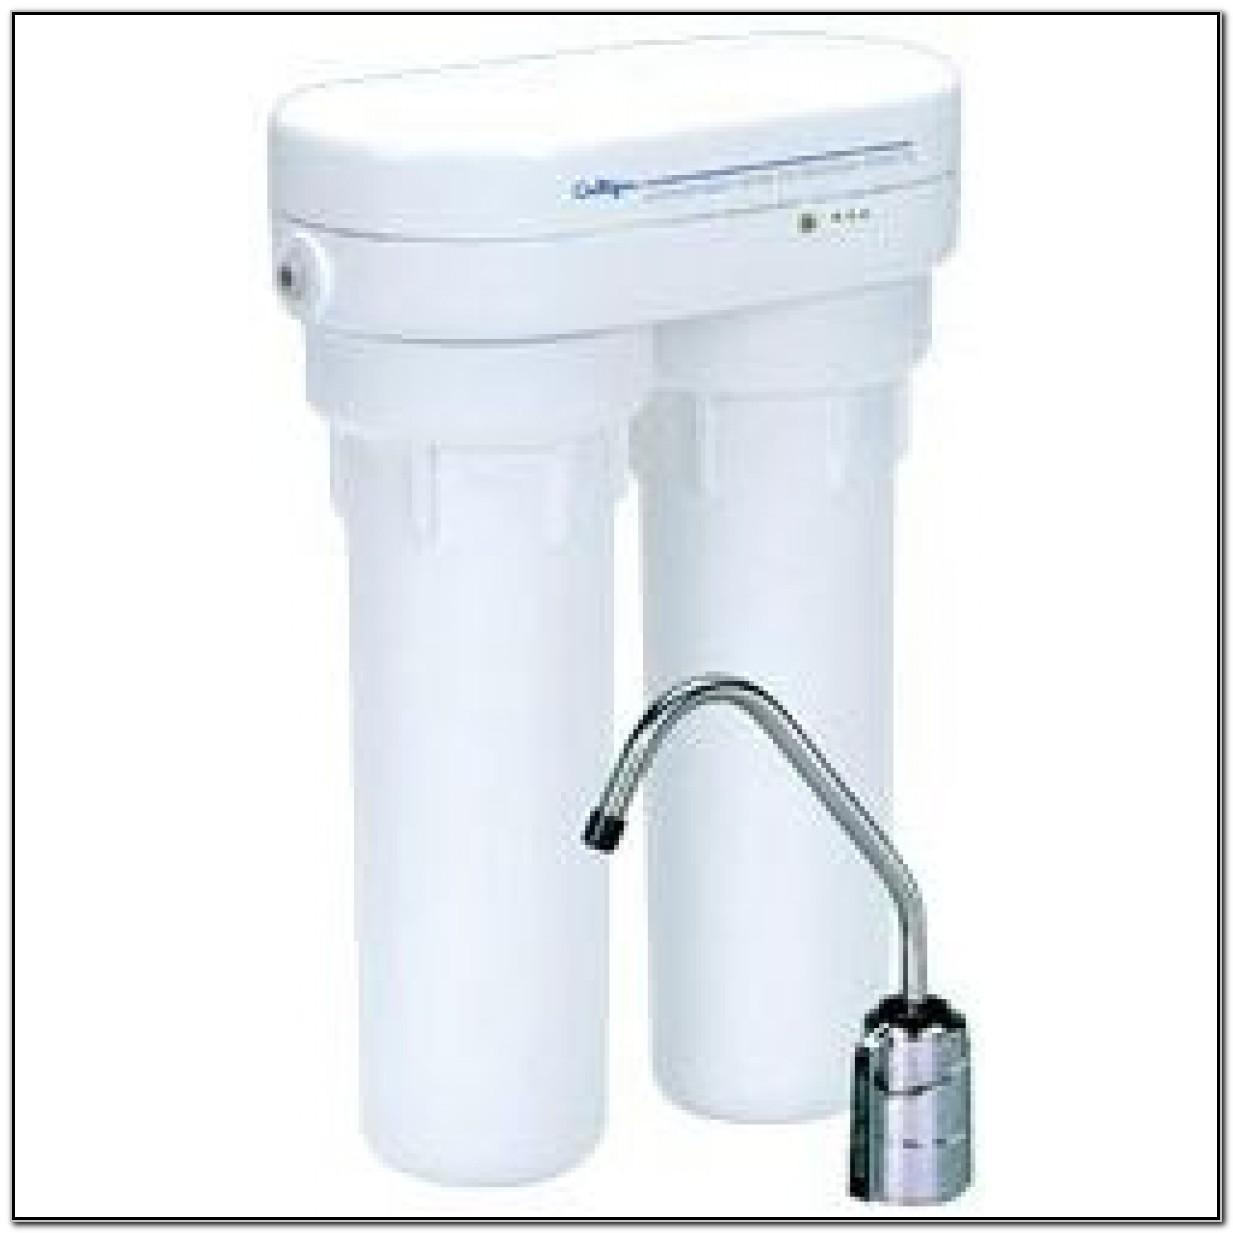 Culligan Under Sink Water Filter System